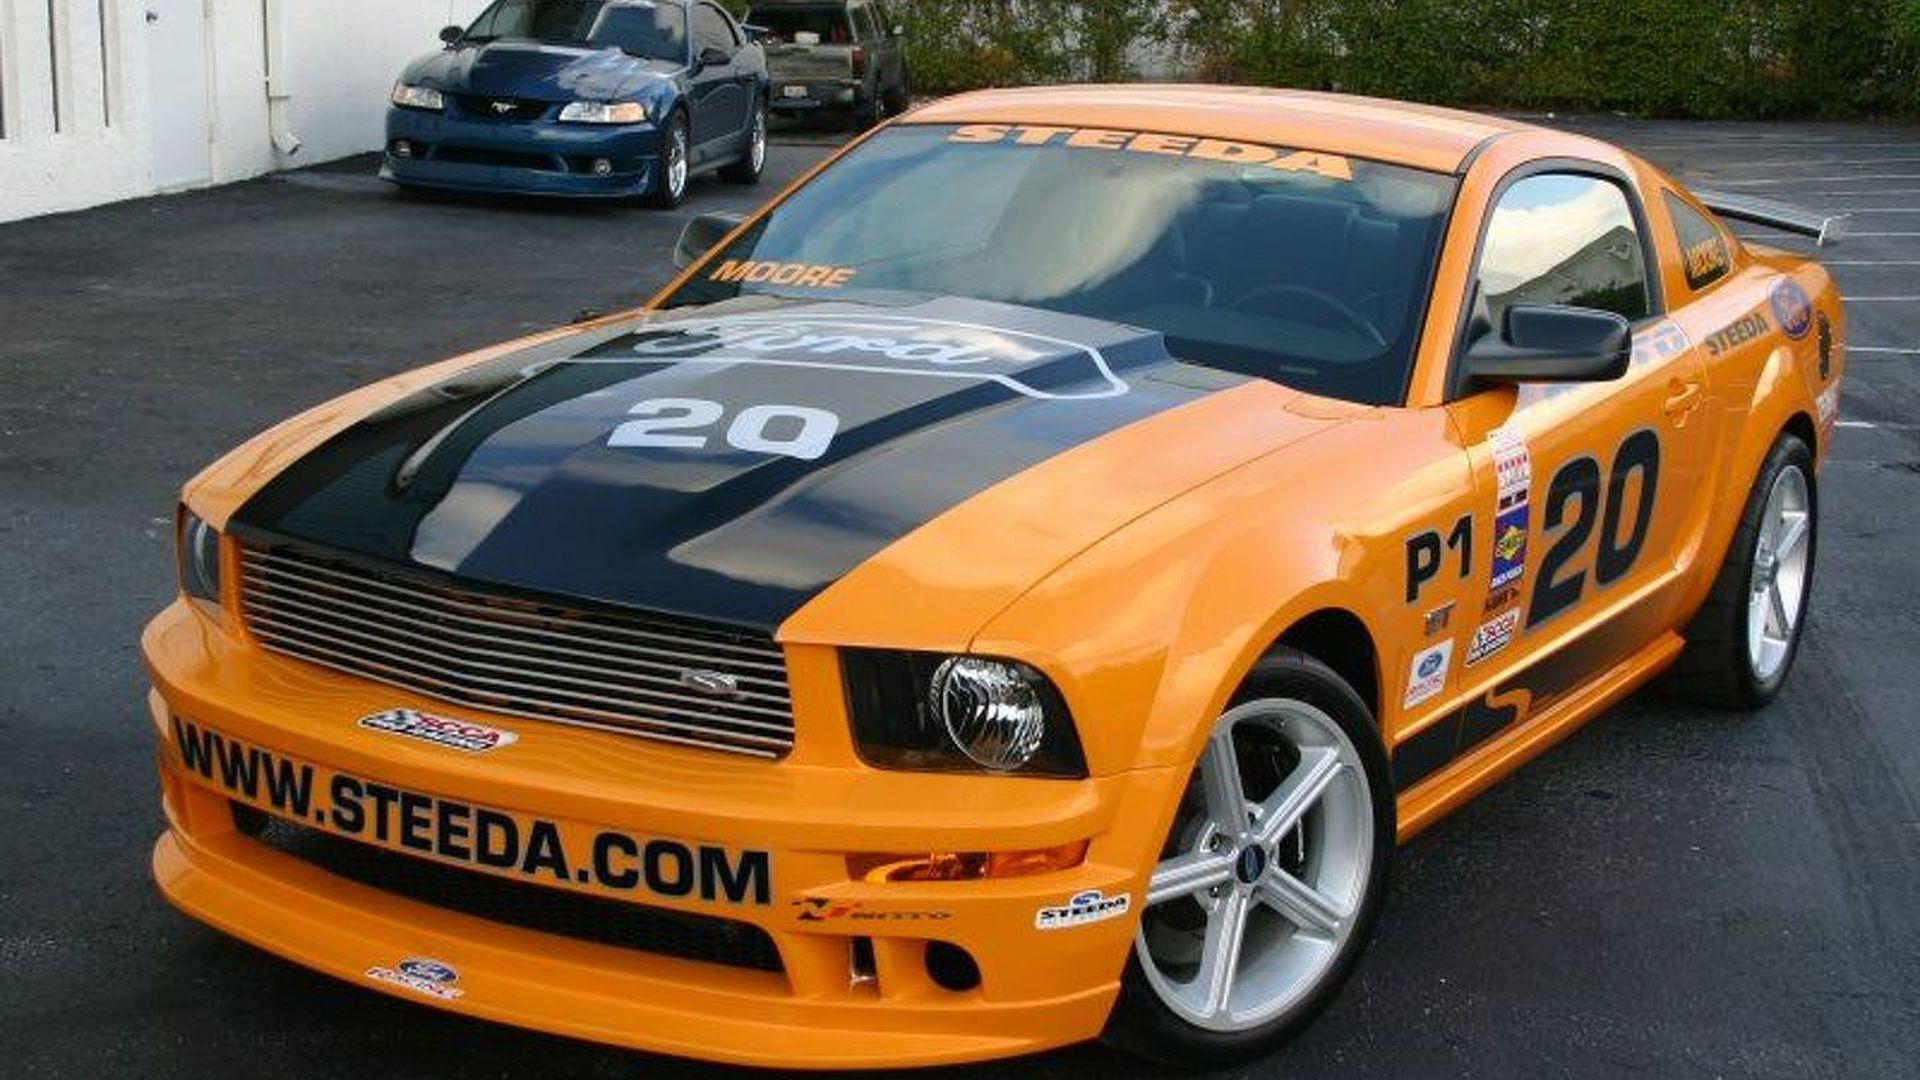 2007 Steeda Club Racer